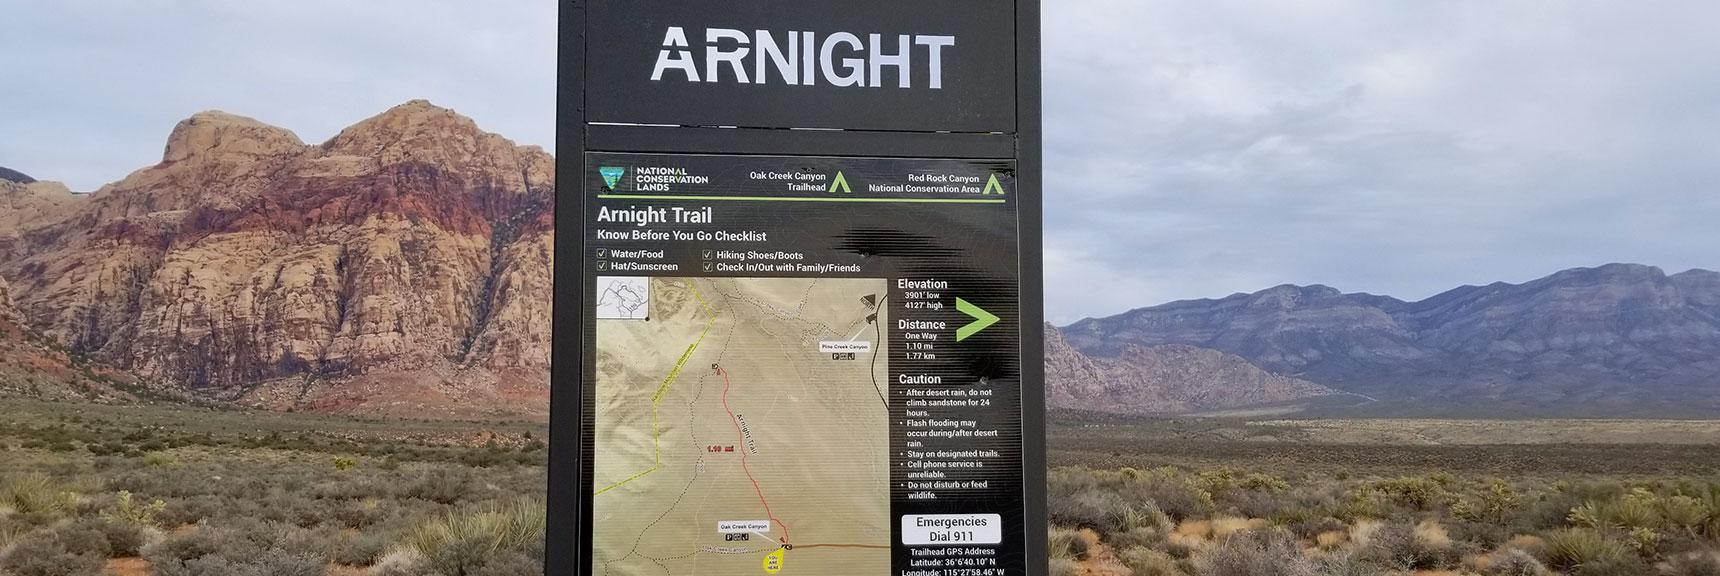 Arnight Trail Along the Base of the Rainbow Mountains, Rainbow Mountain Wilderness, Nevada